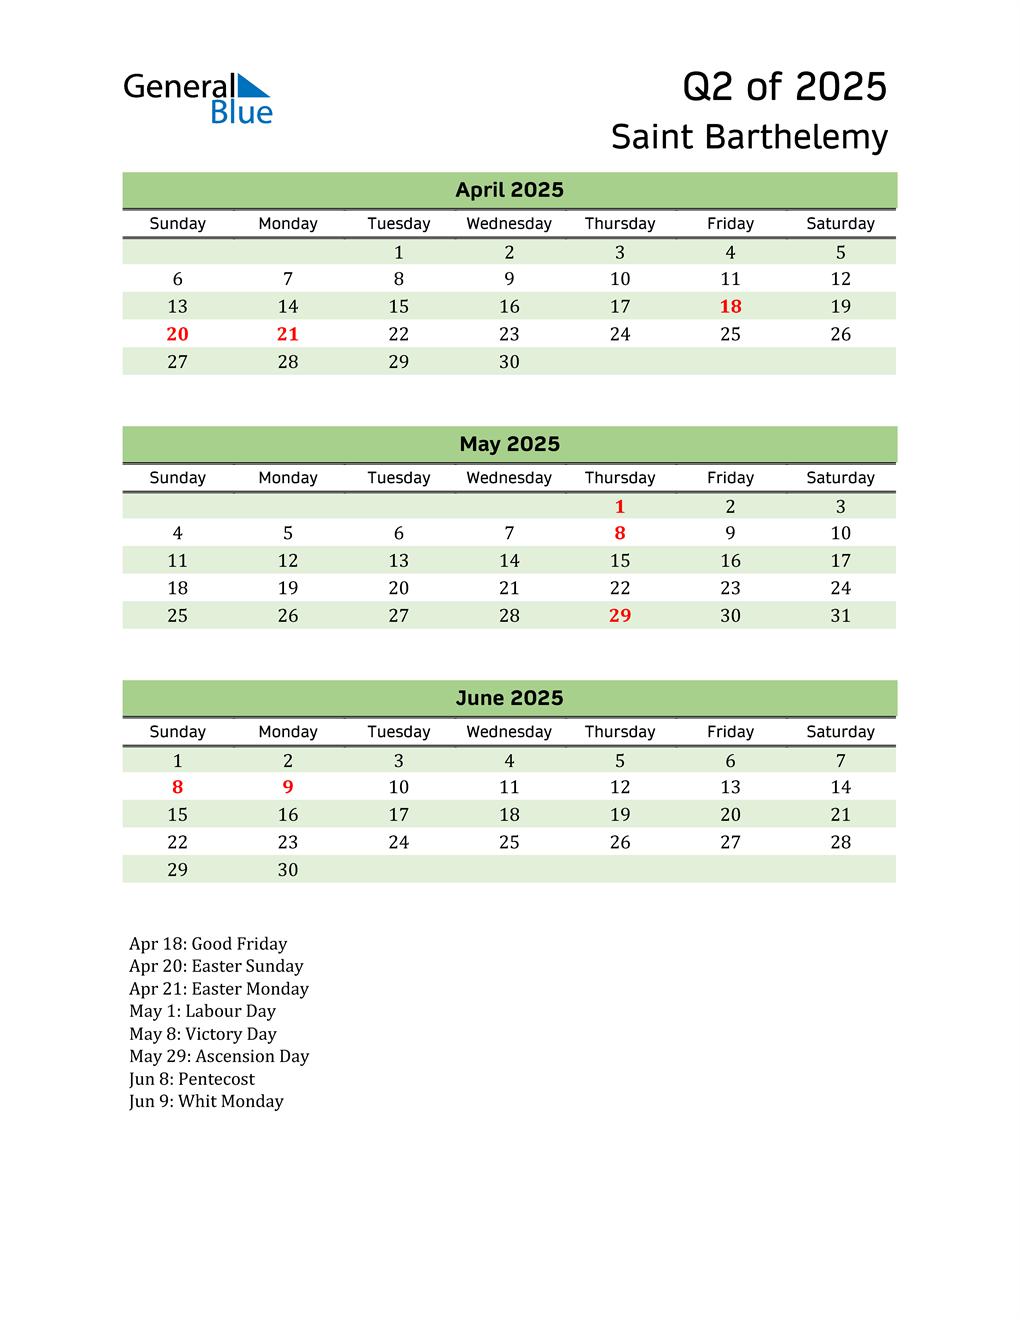 Quarterly Calendar 2025 with Saint Barthelemy Holidays